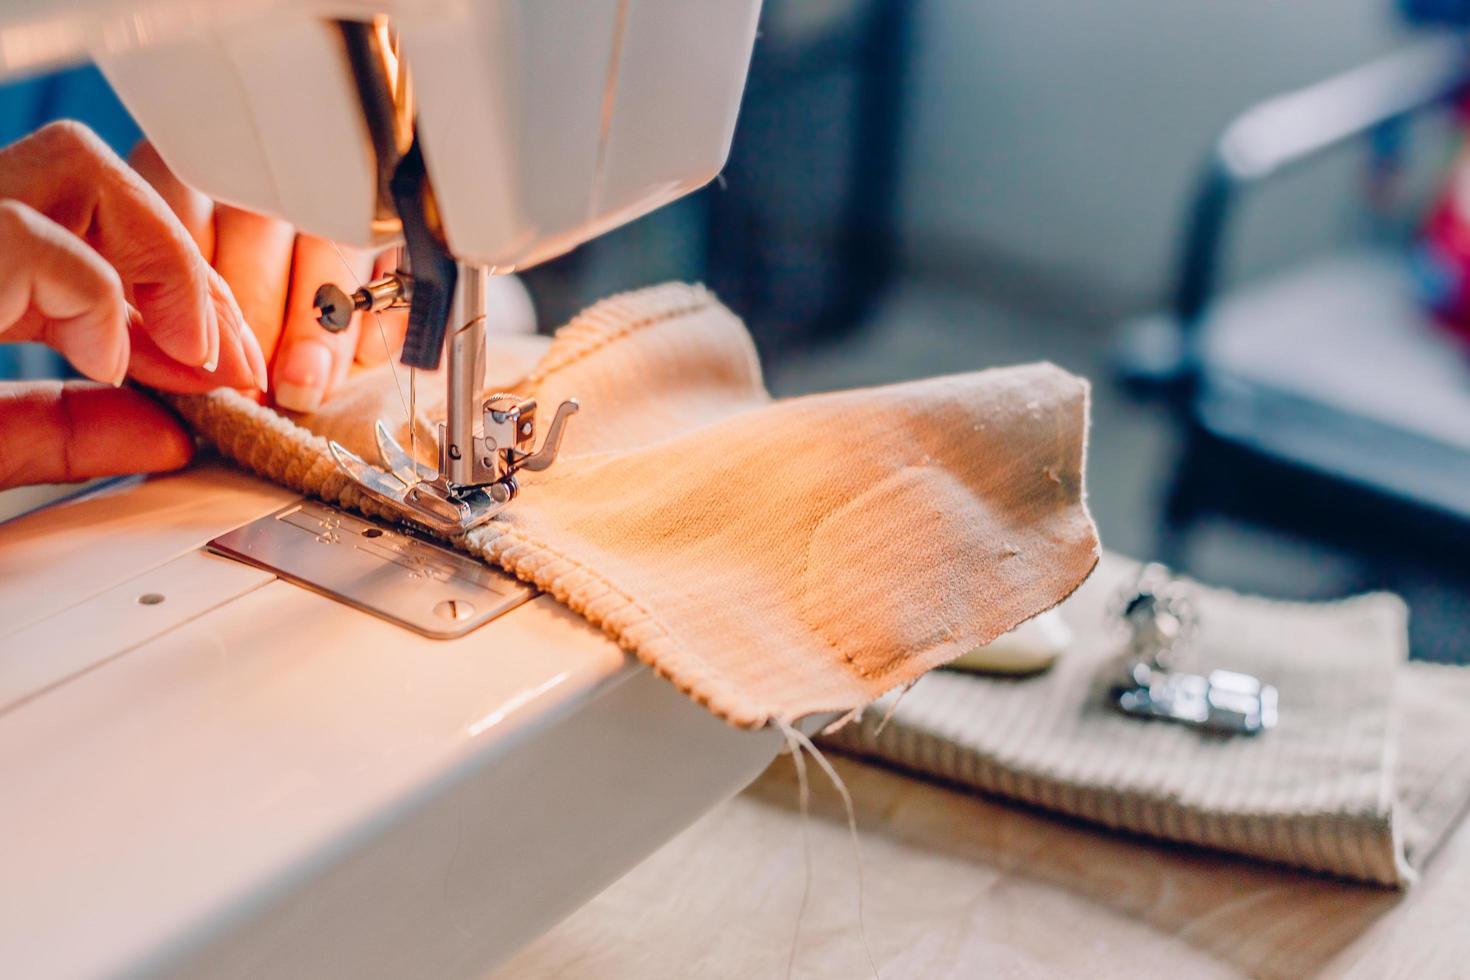 Female hands stitching fabric on machine  photo